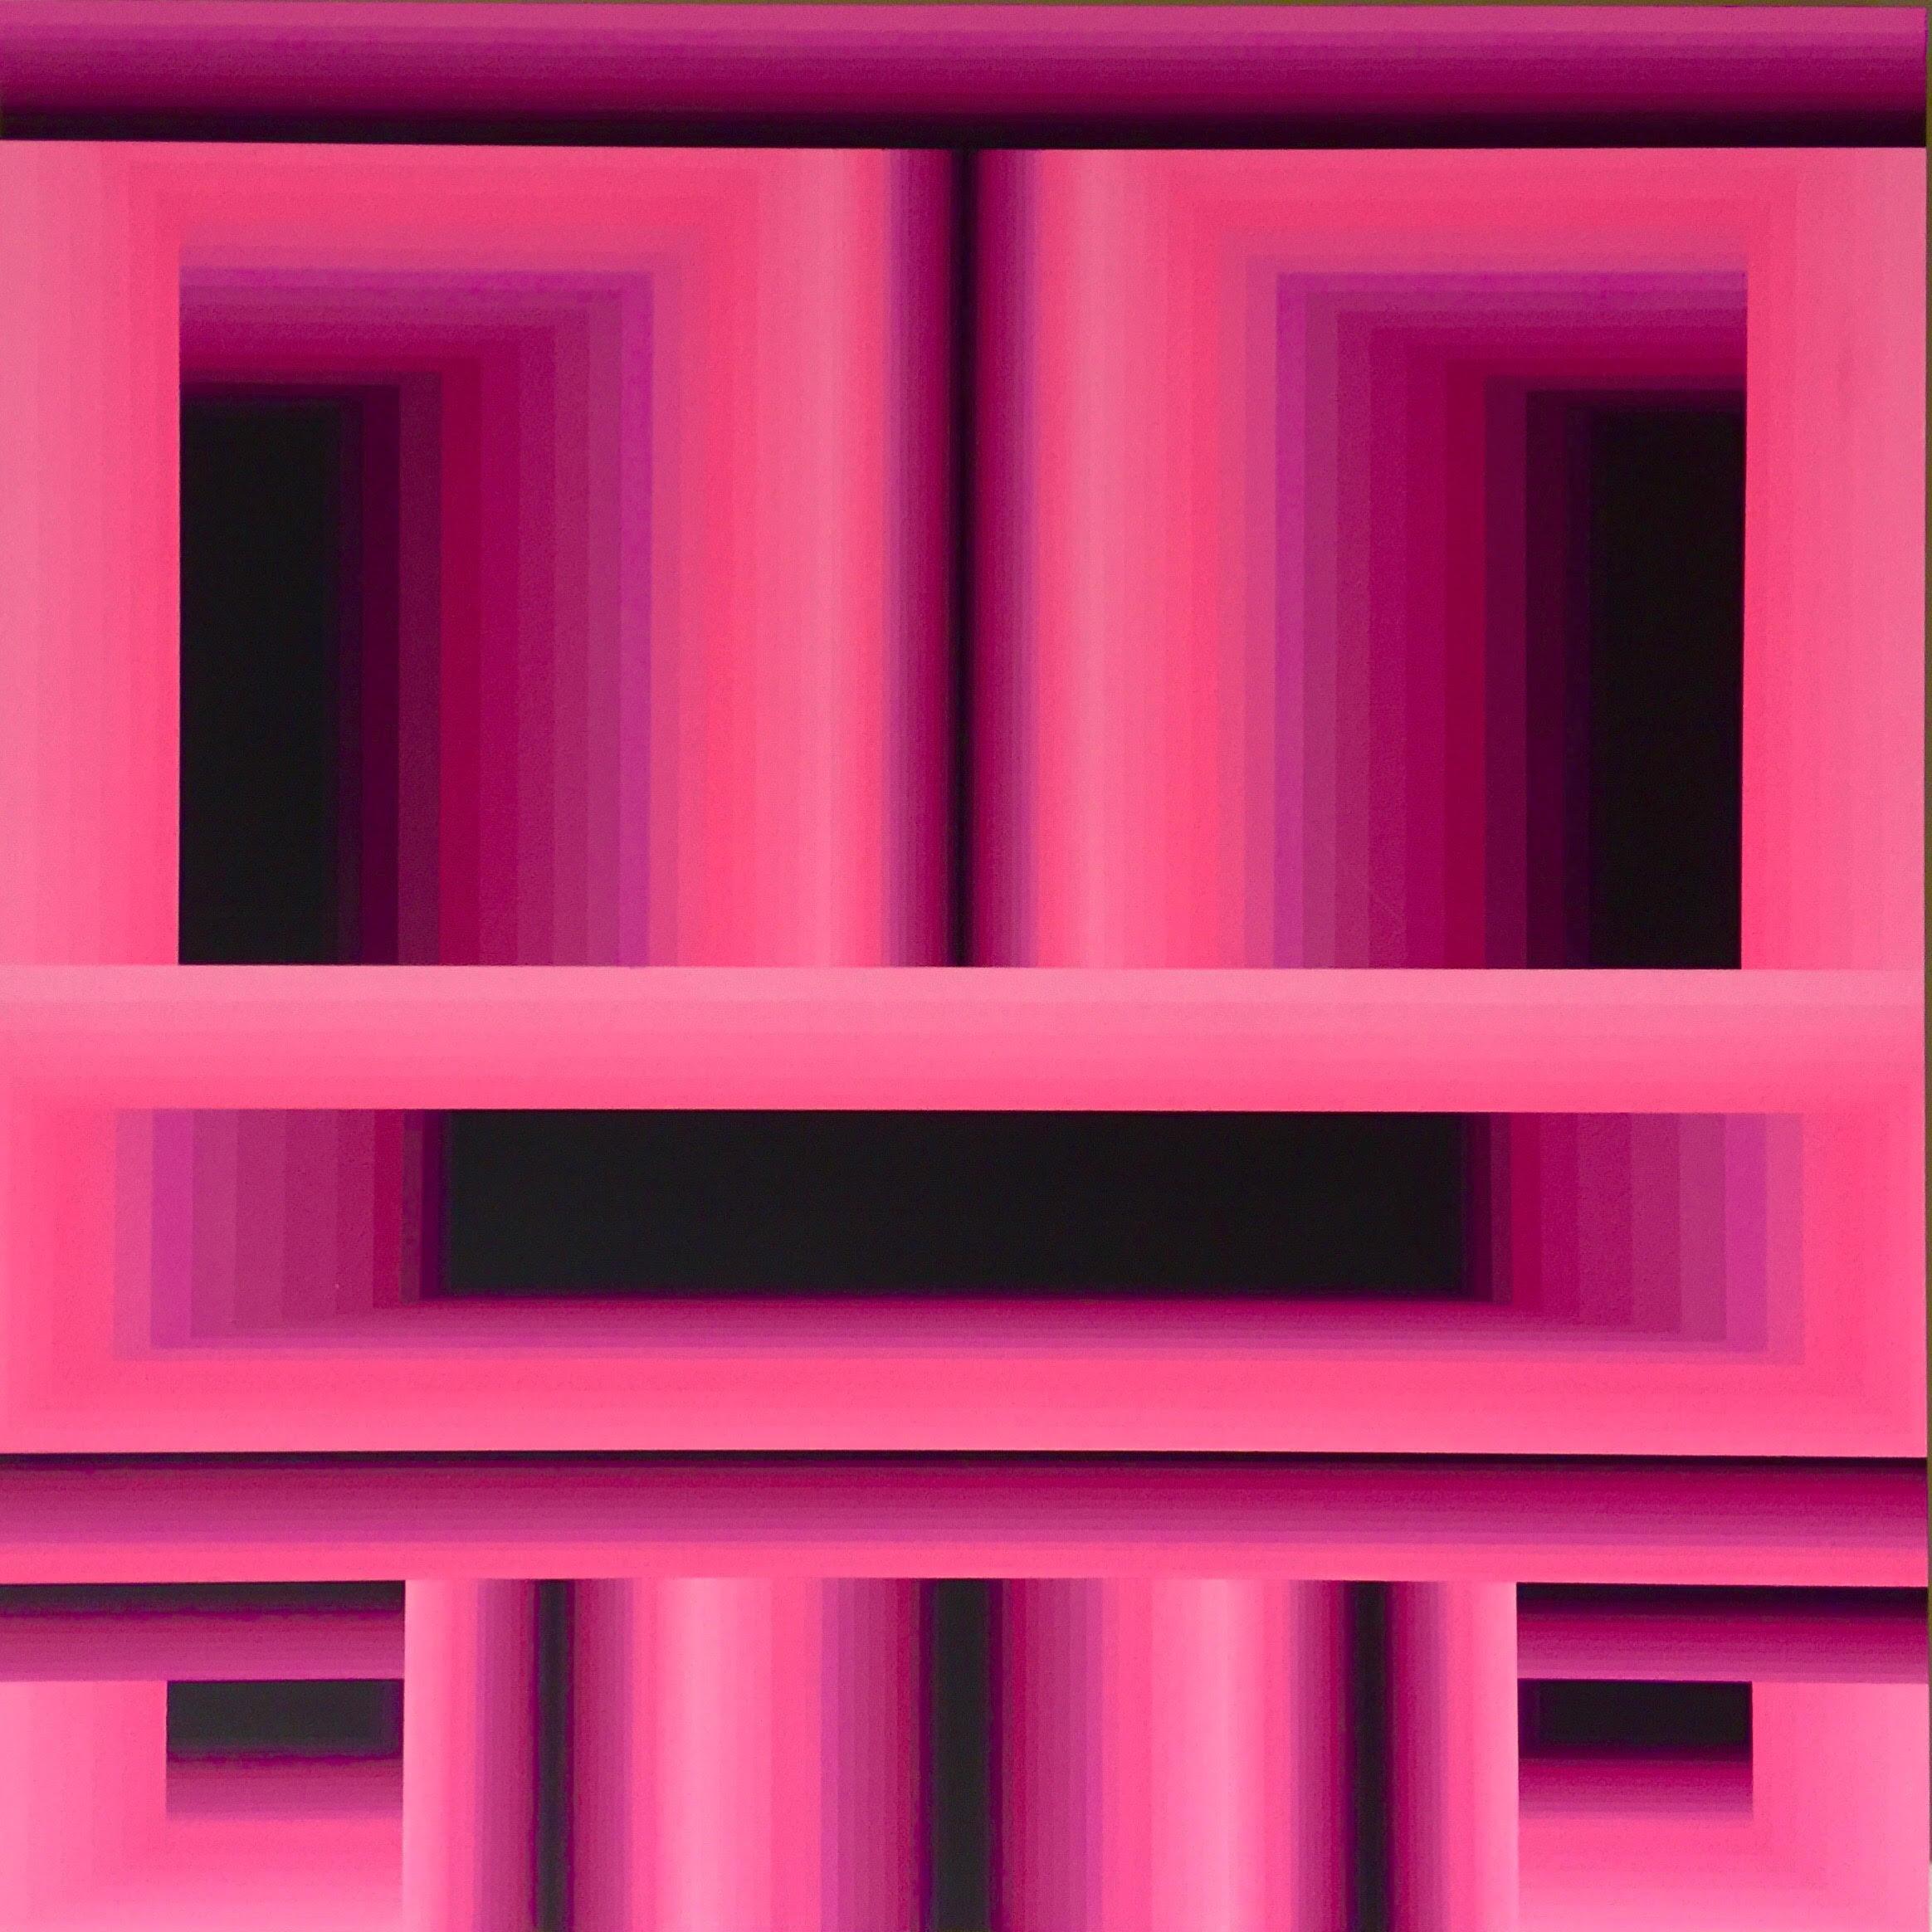 Untitled Pink by Dalek